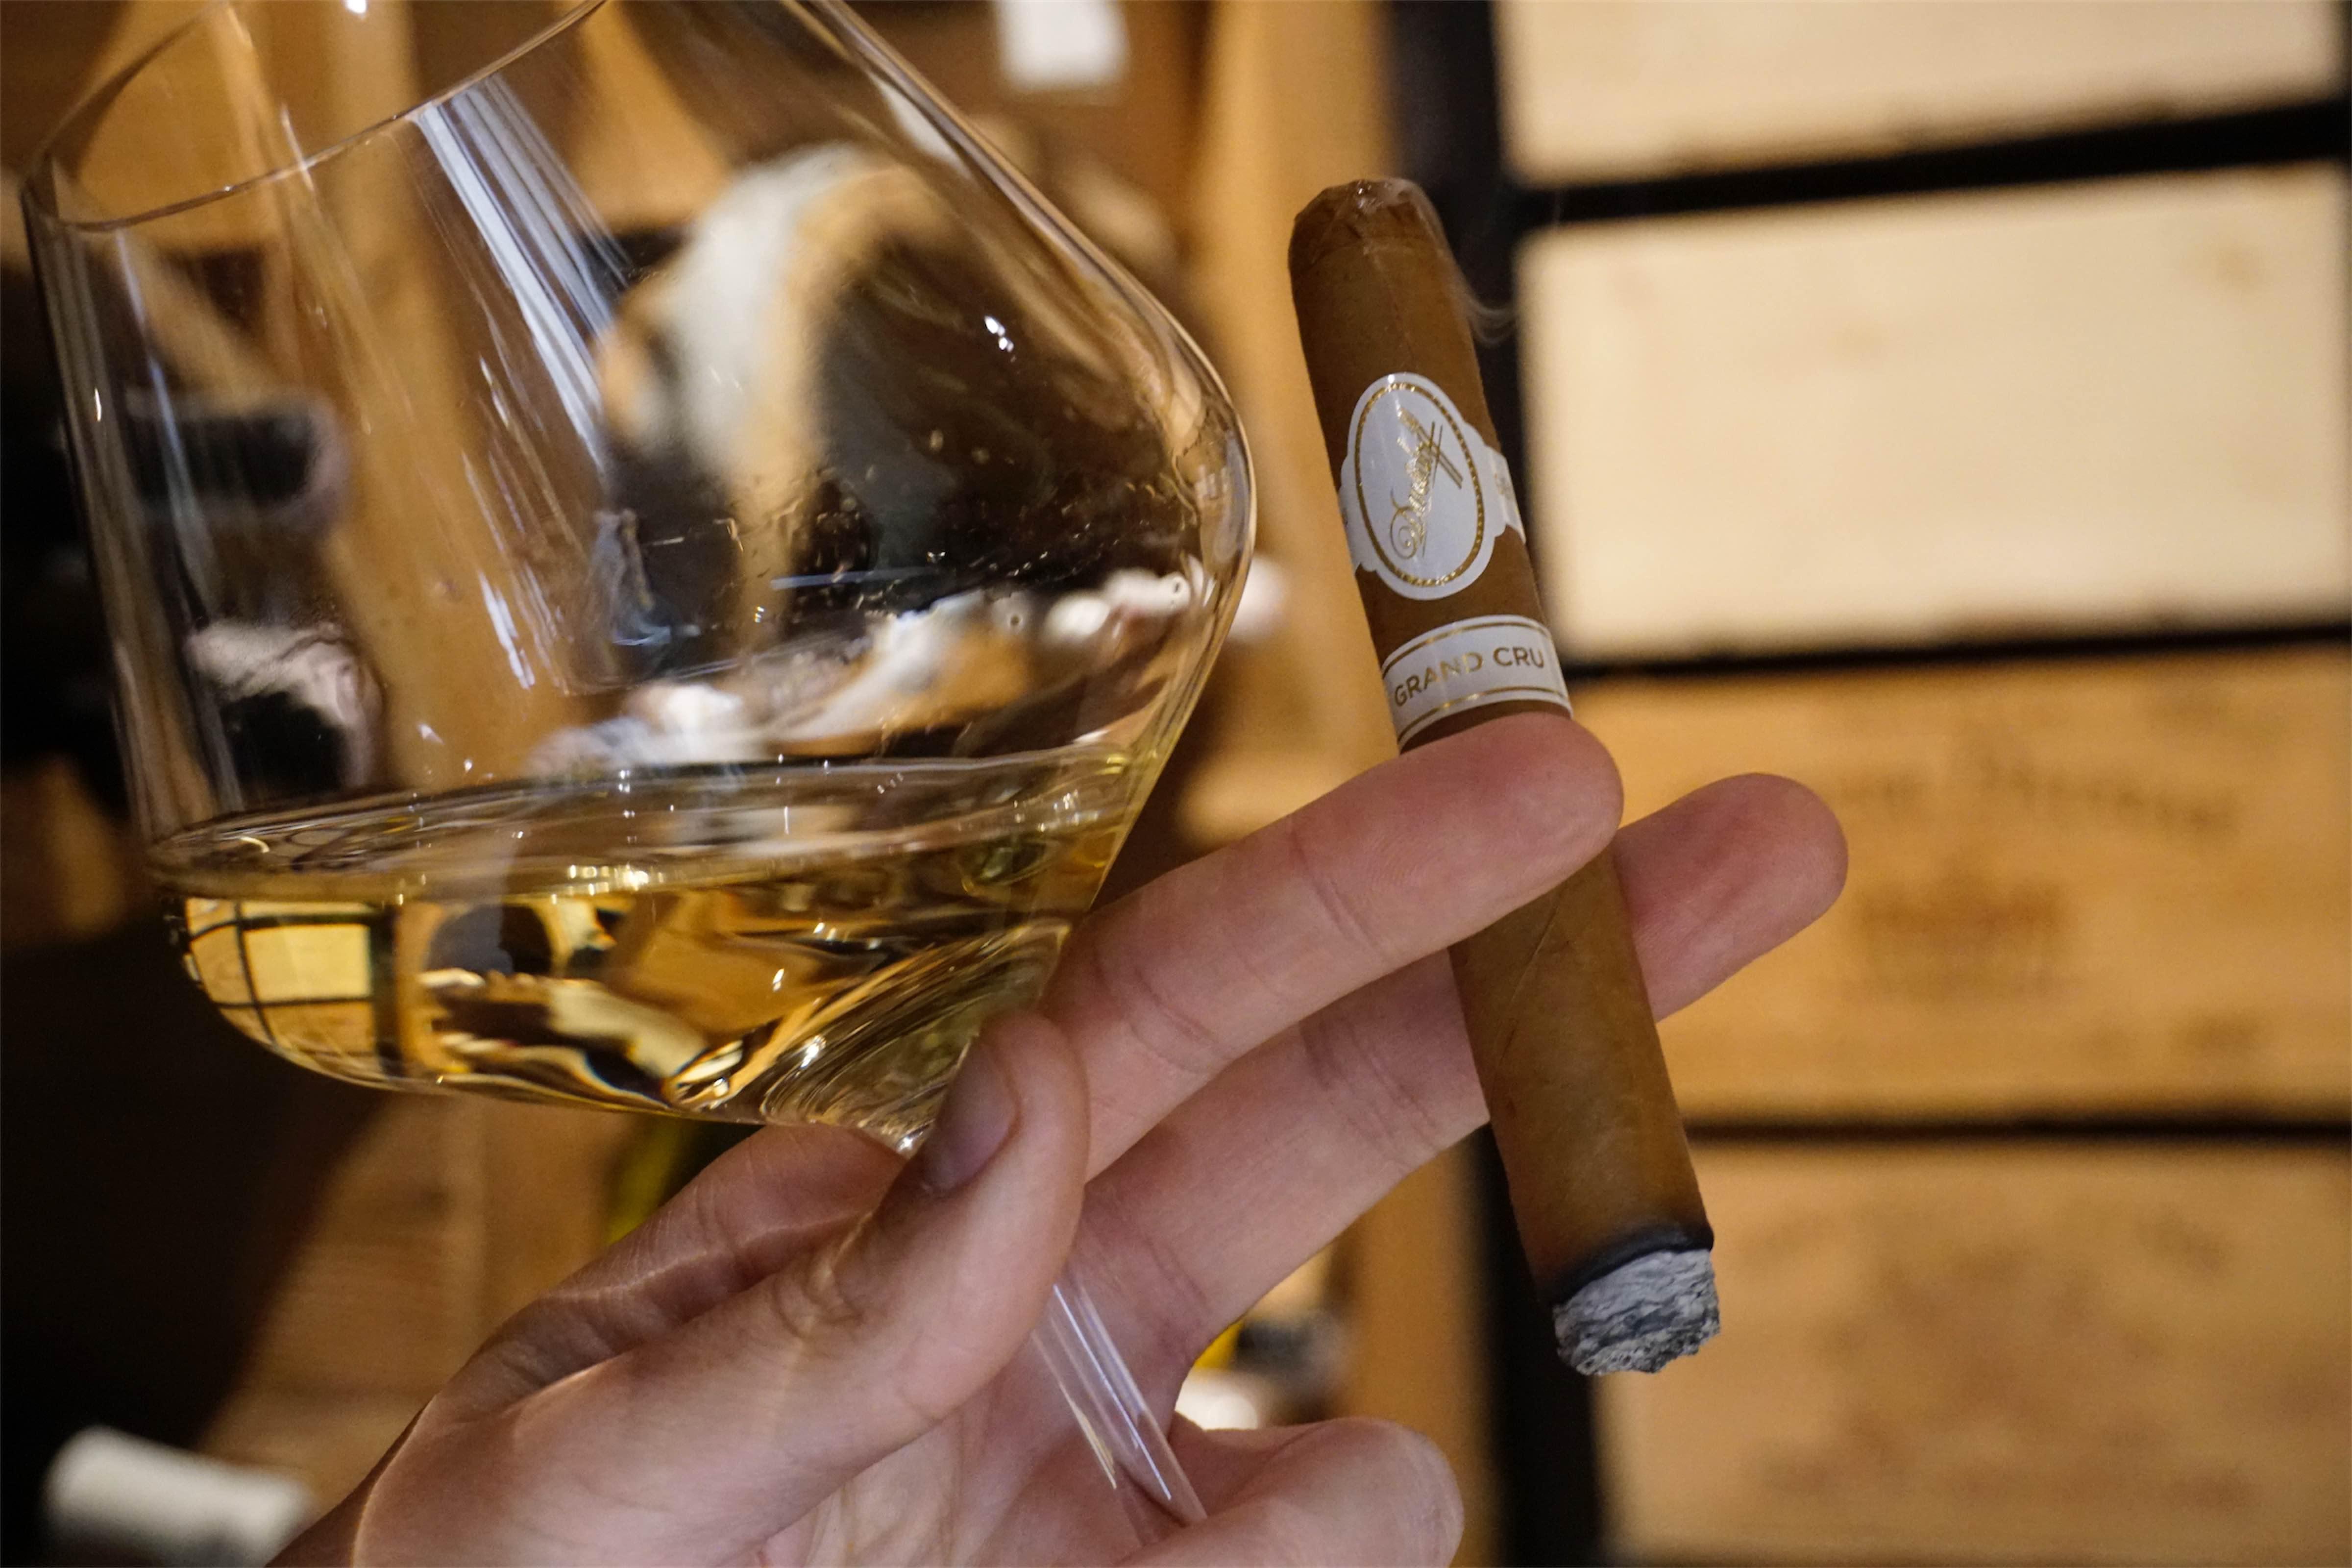 Wino i cygaro - Davidoff Grand Cru - Manufaktura Marzeń